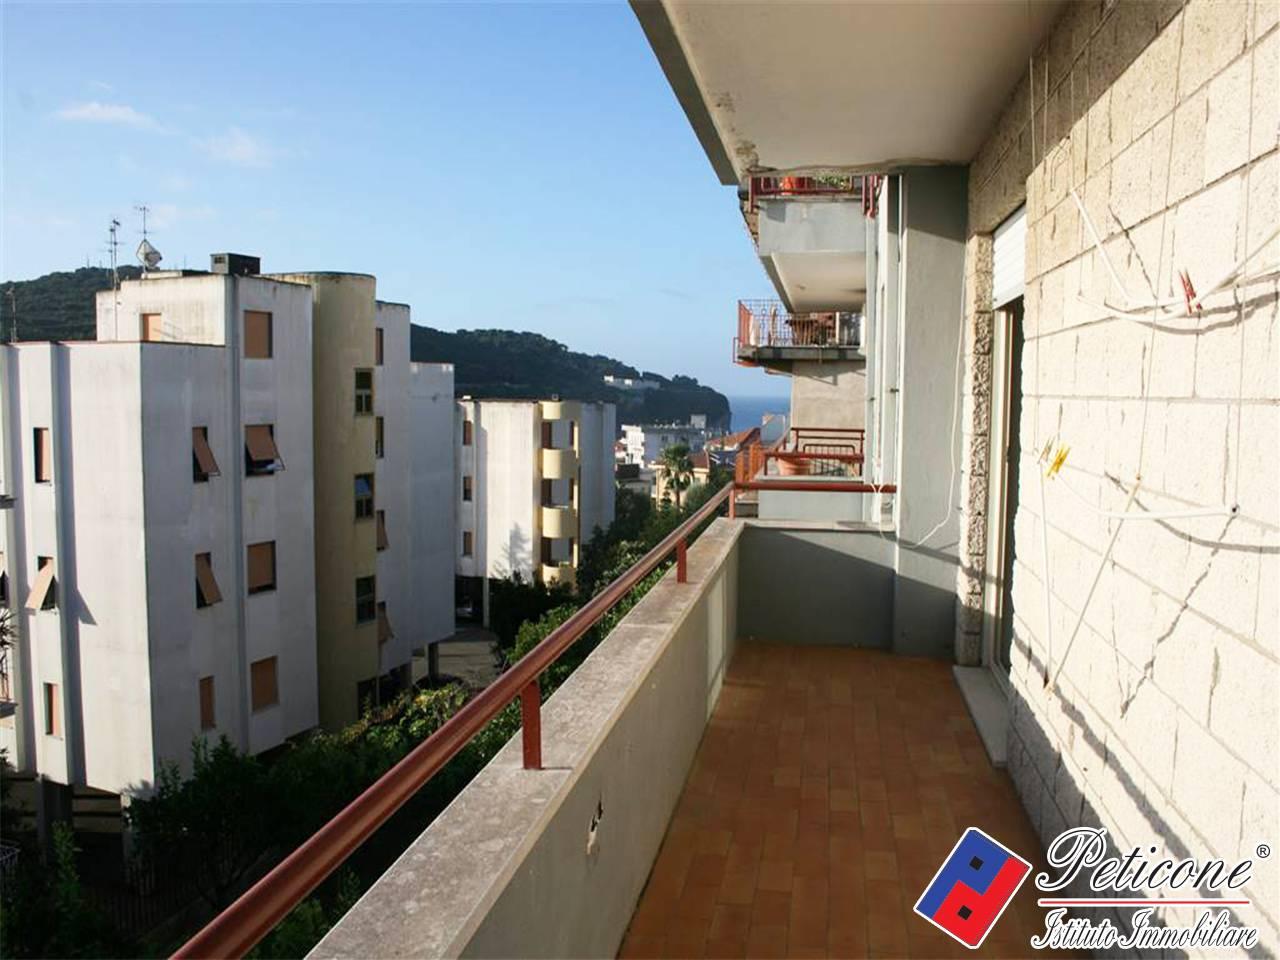 Appartamento in Vendita a Gaeta: 4 locali, 91 mq - Foto 10